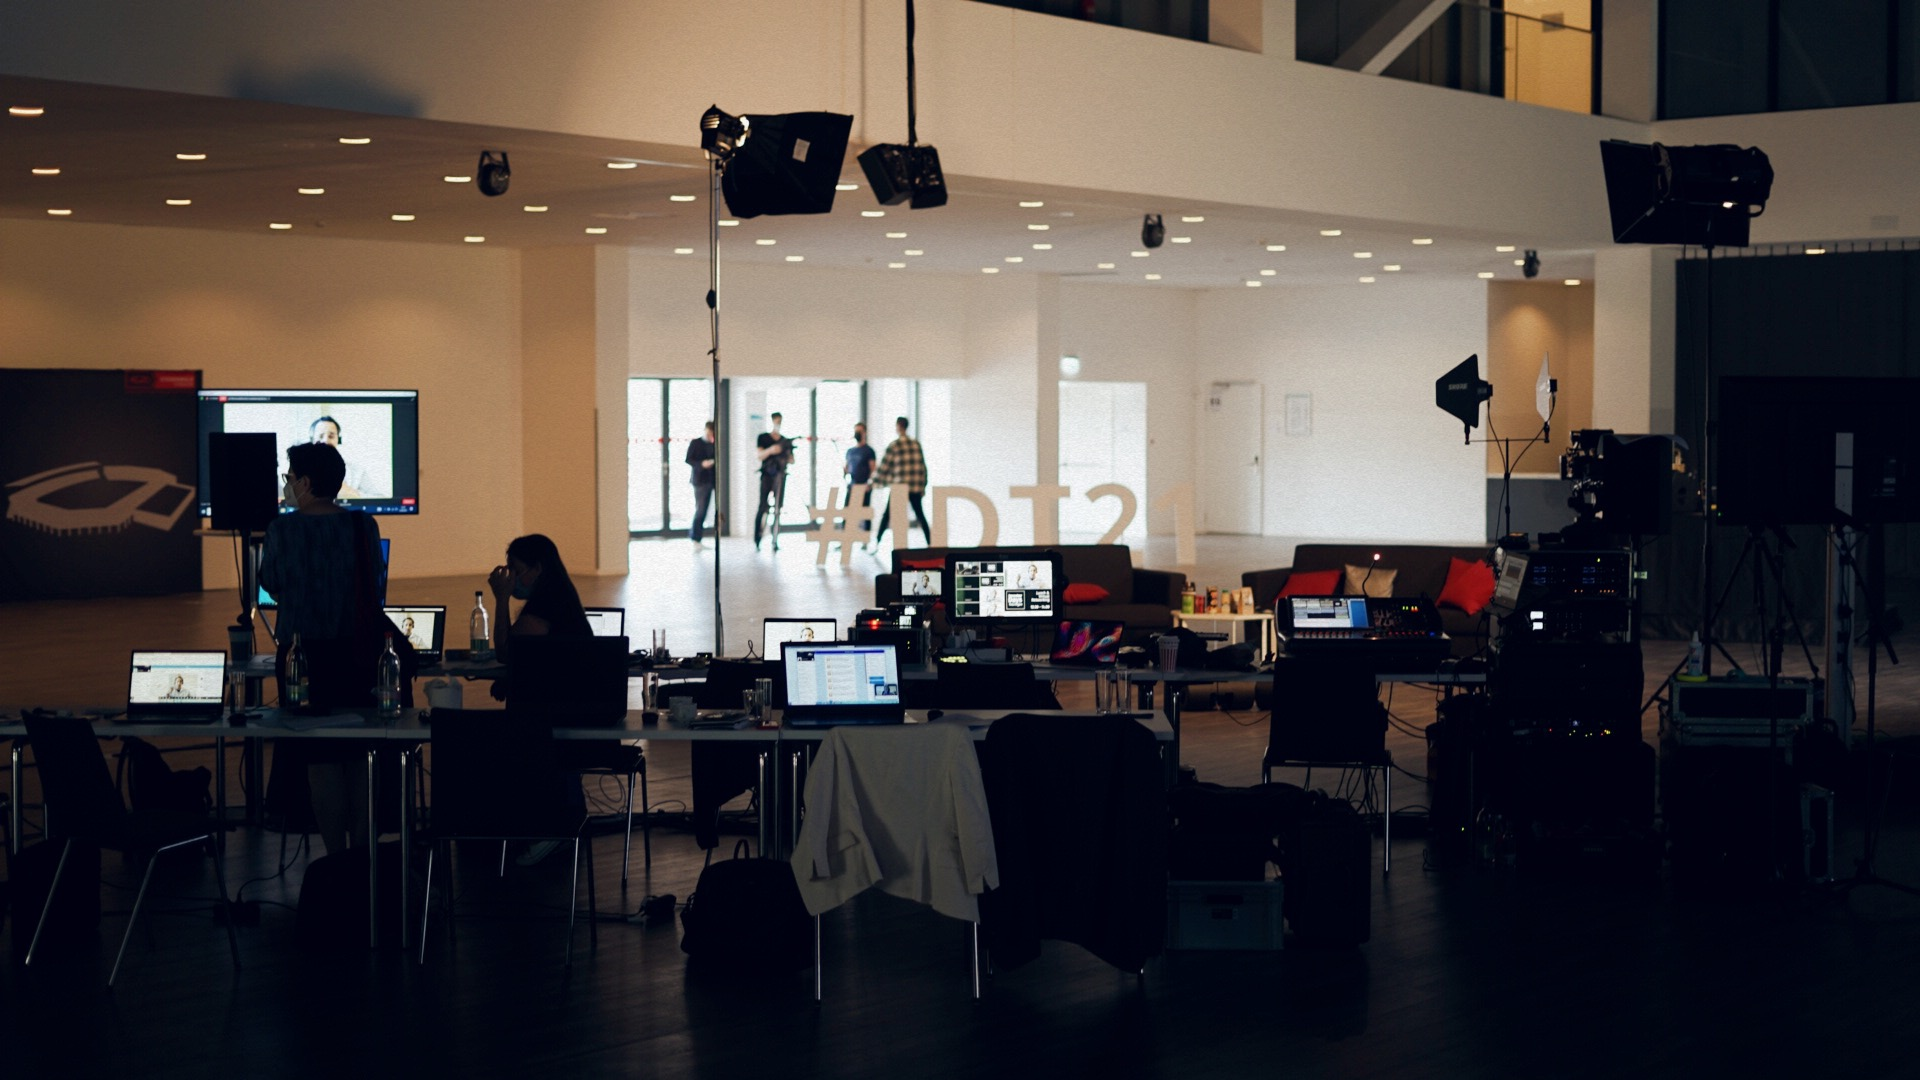 Bilder Investor Days Thueringen - 06